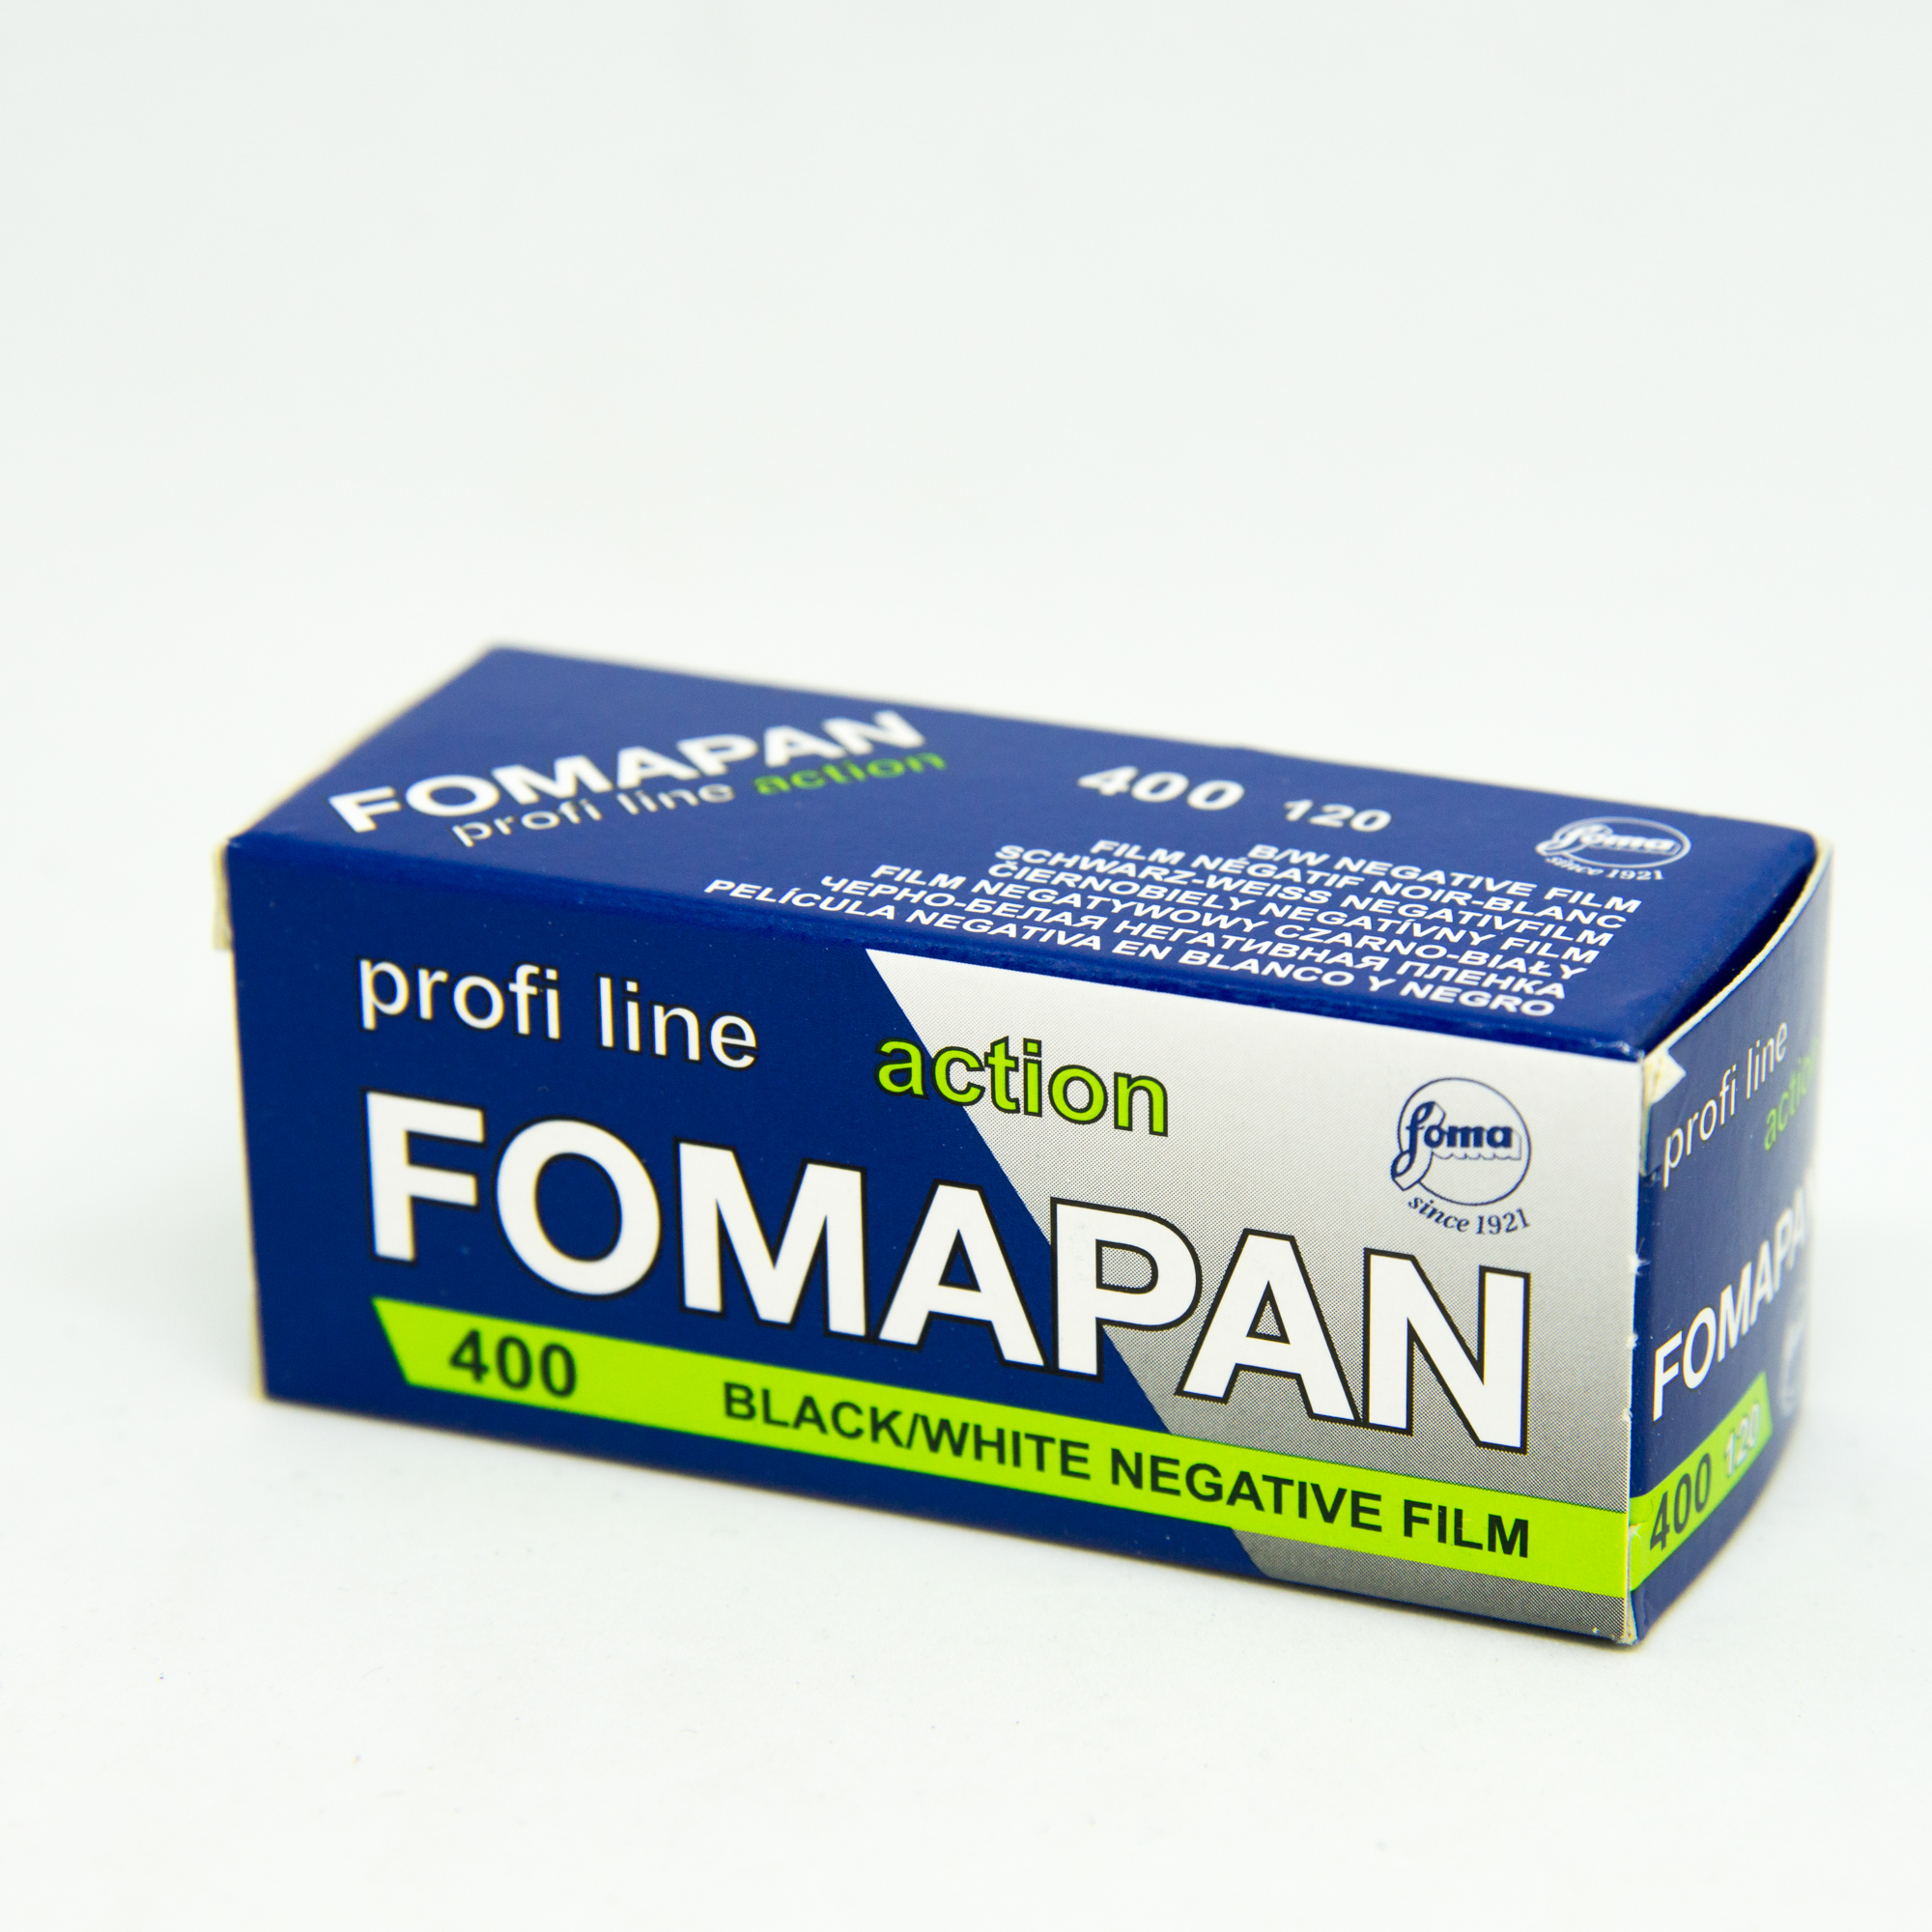 Фотопленка Foma Fomapan 400 Action /120 B&W